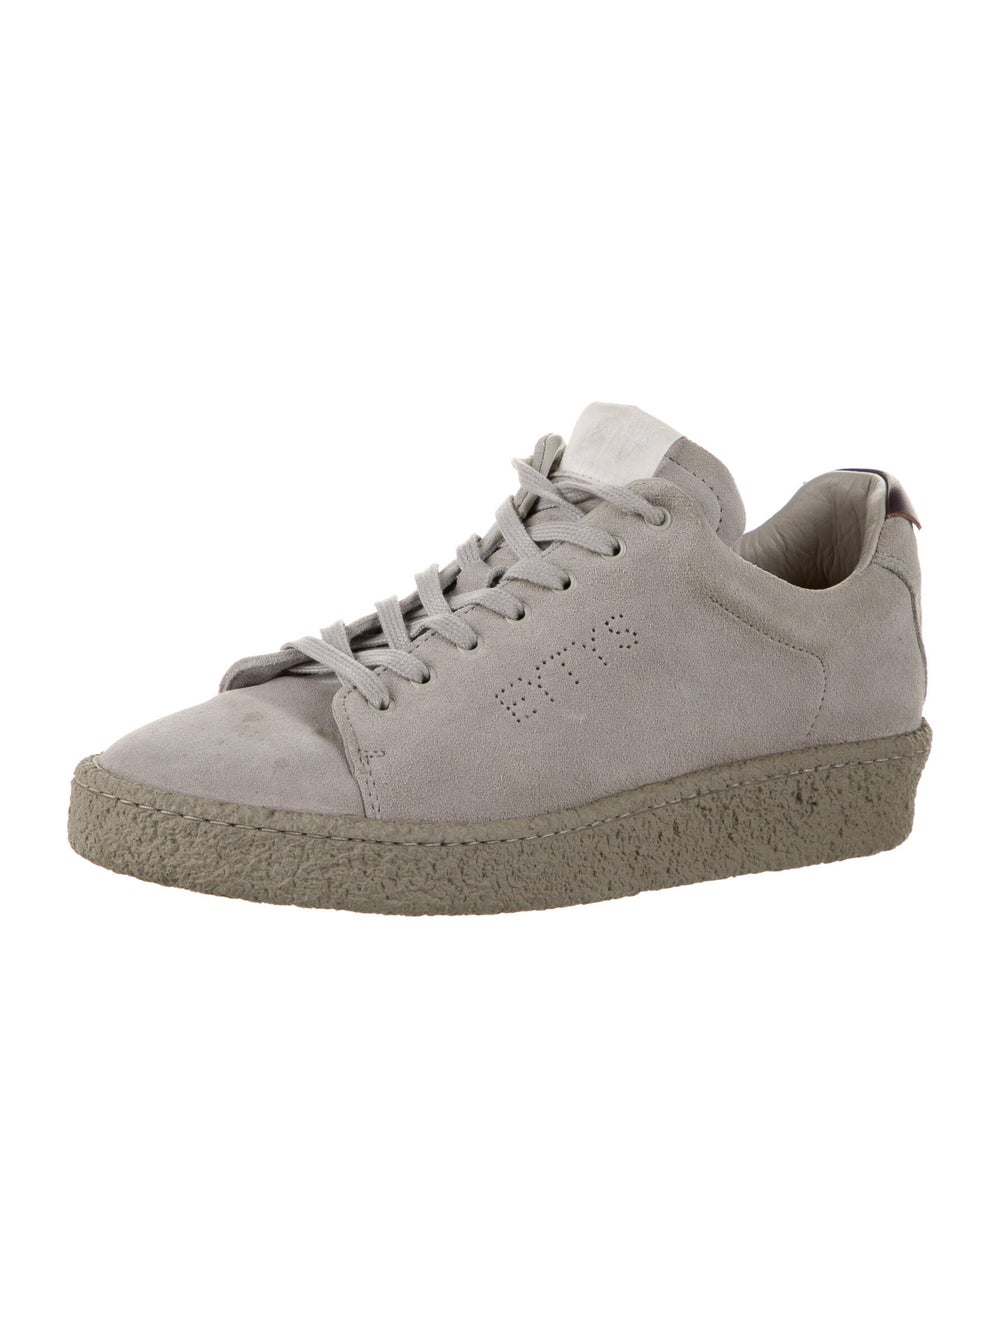 Eytys Suede Sneakers Grey - image 2